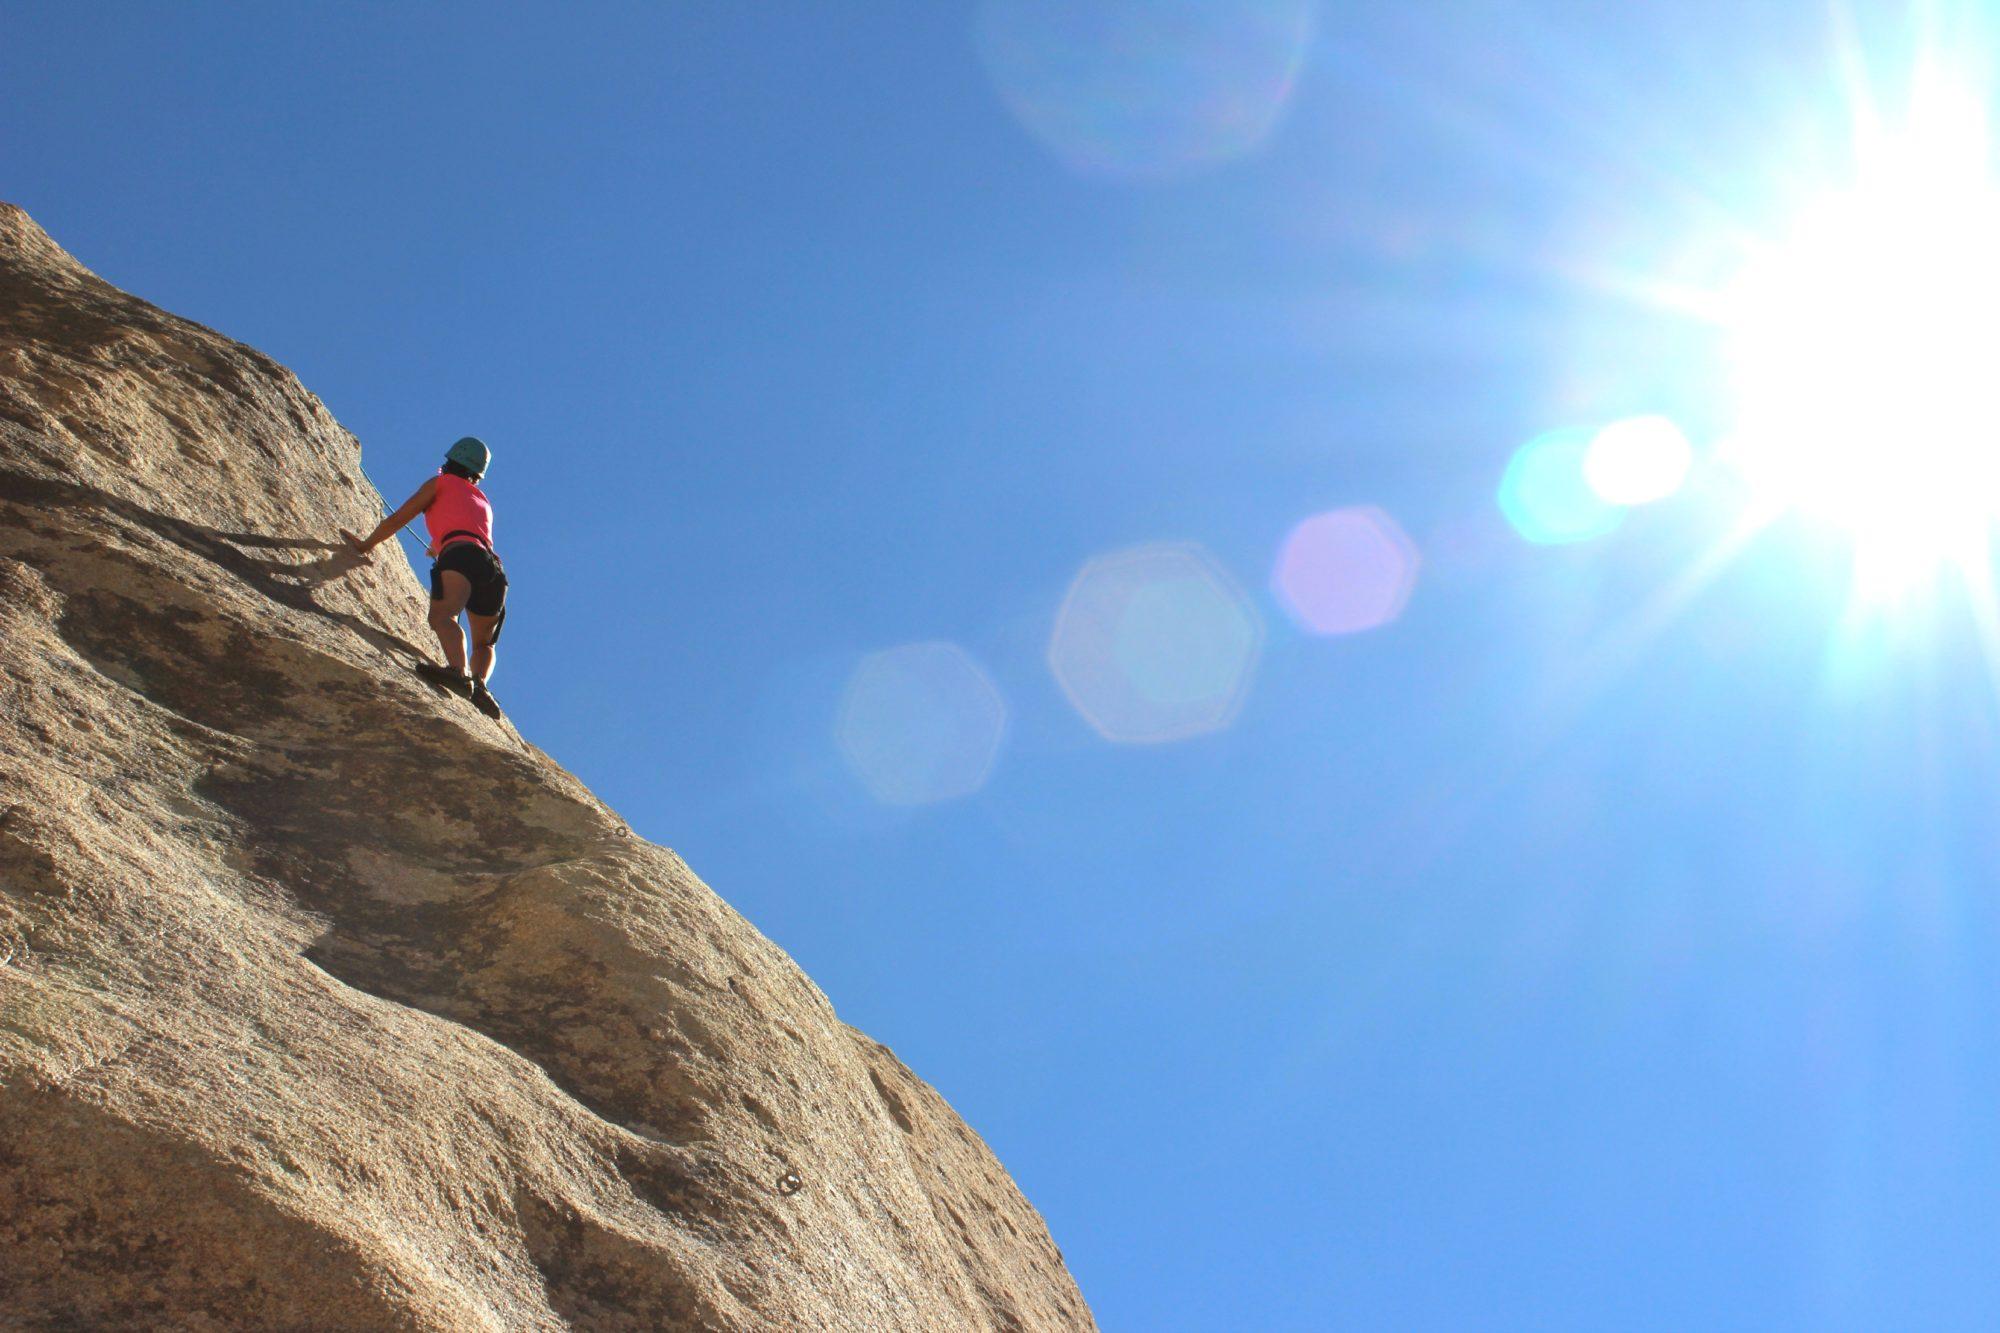 The Climb: Overcoming Critics on the Climb [podcast]